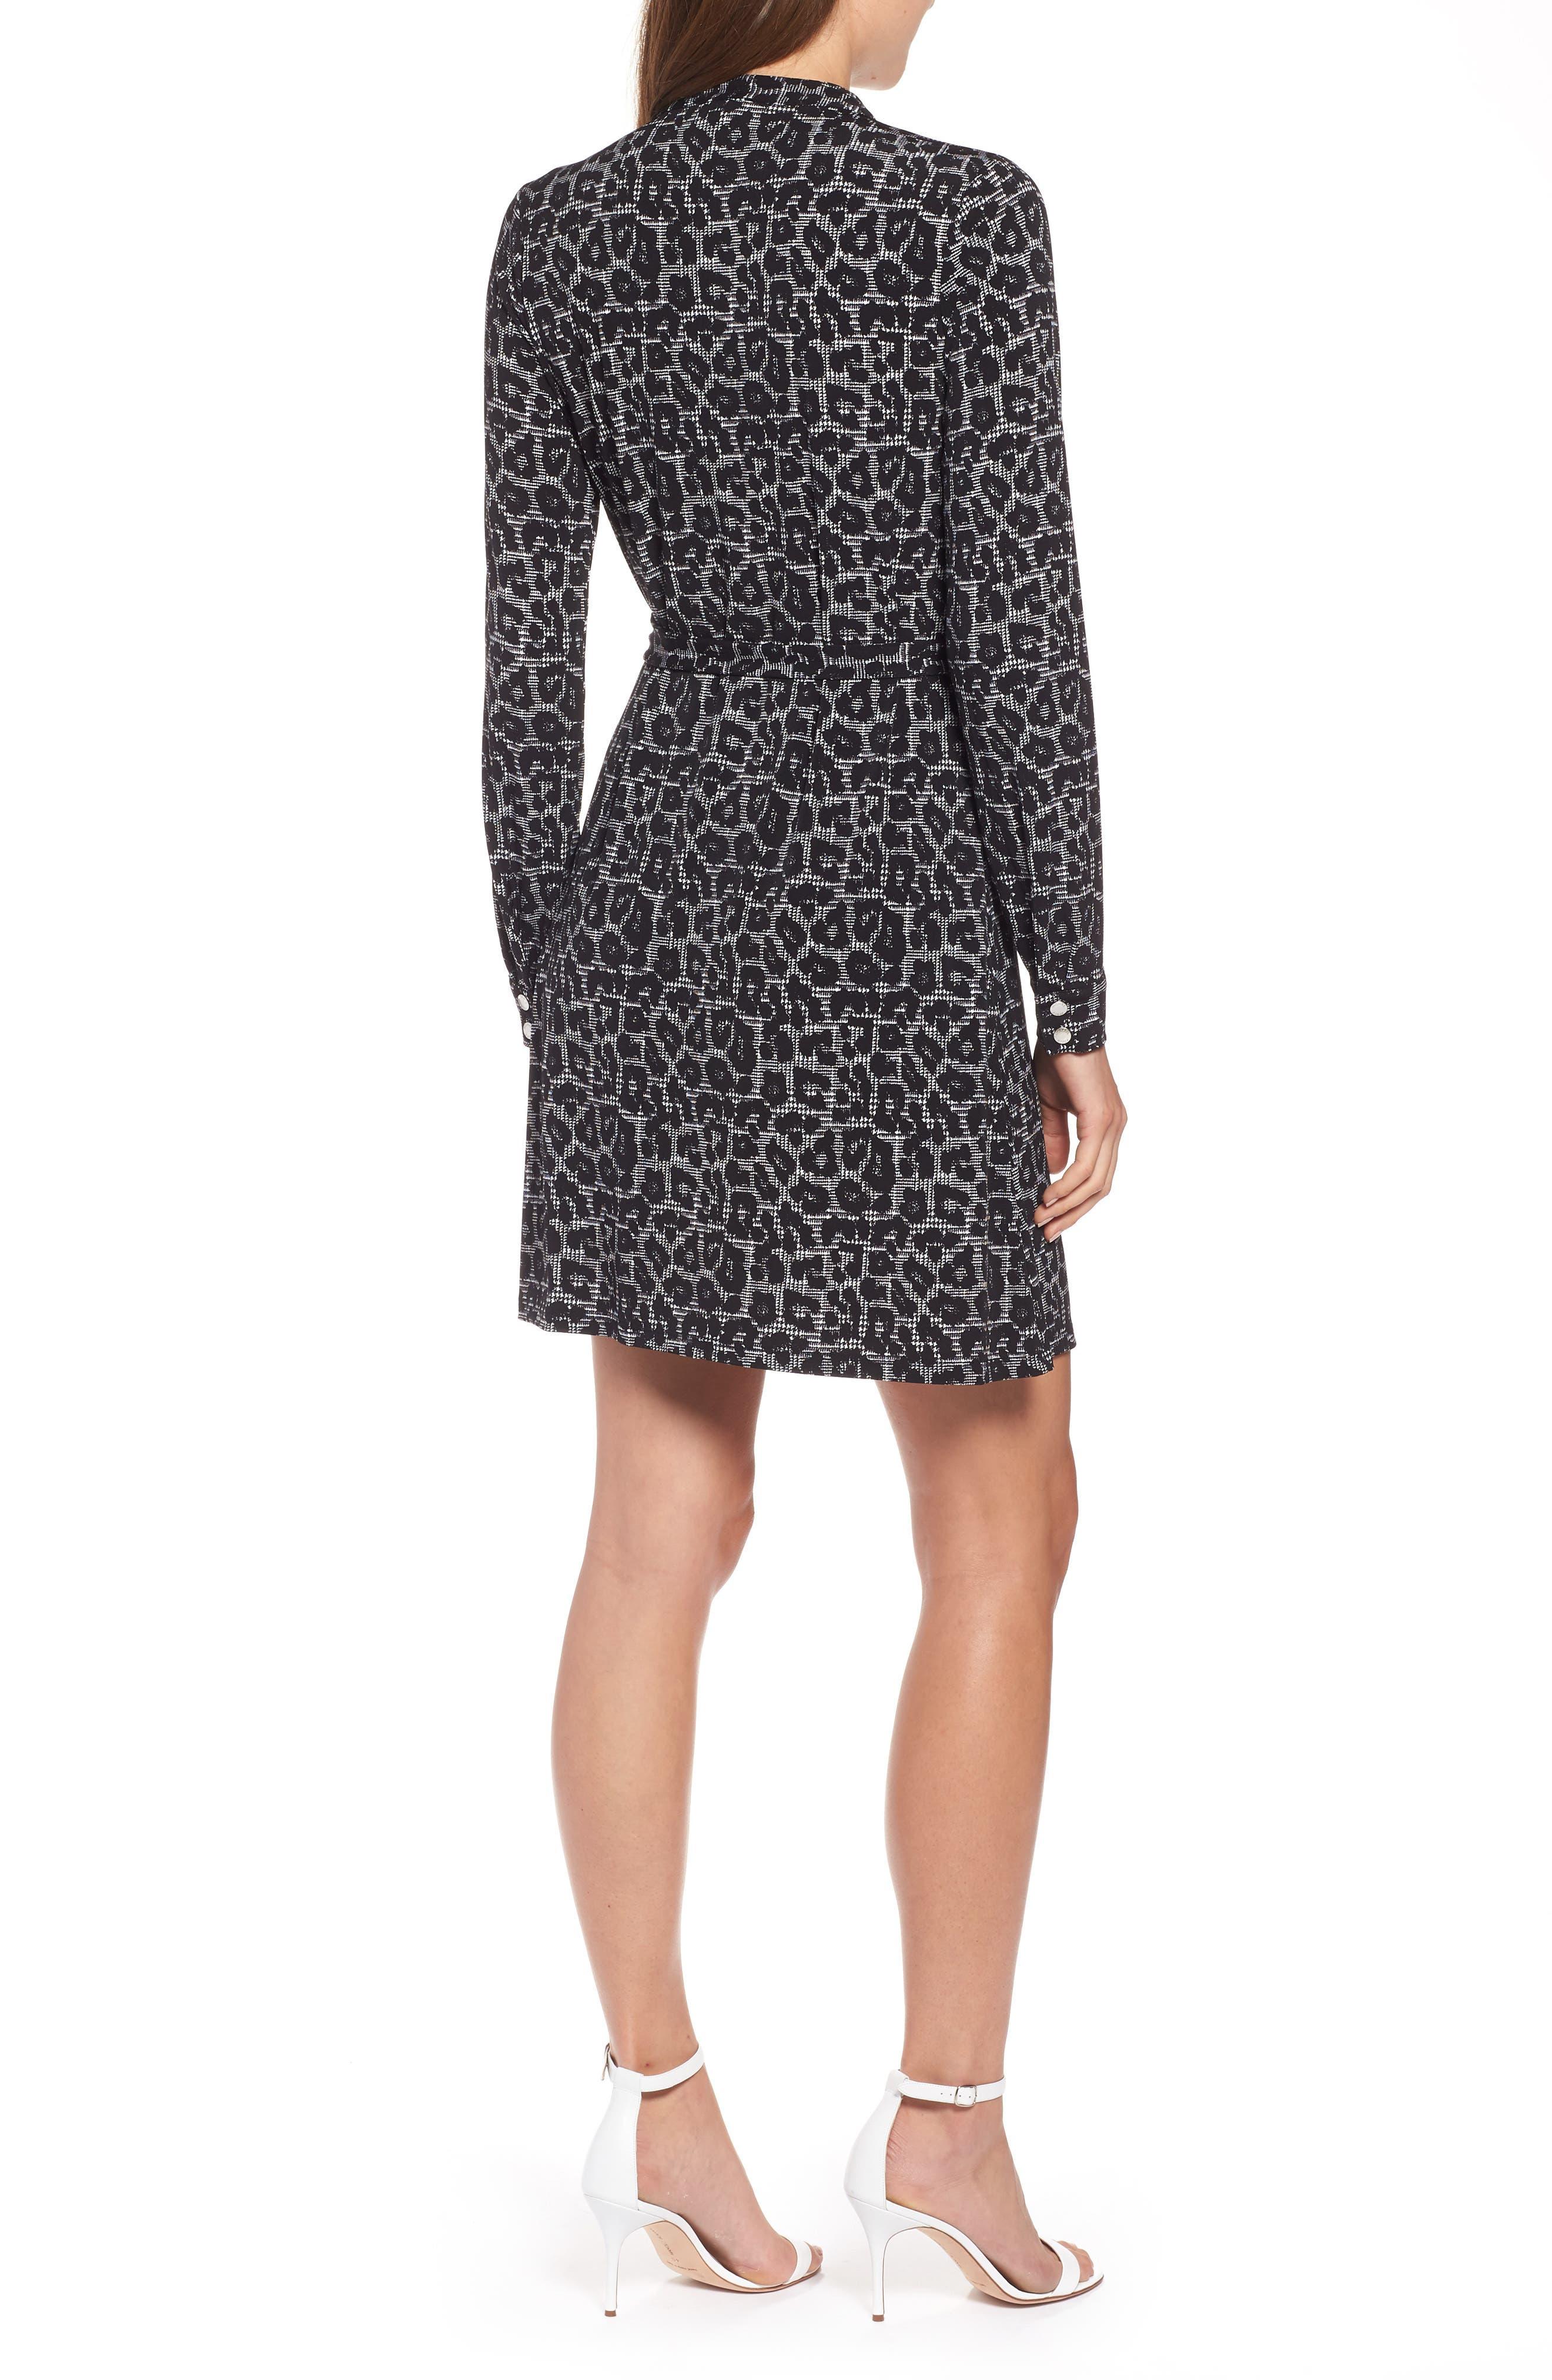 MICHAEL Michael Kors Leopard Plaid Shirtdress,                             Alternate thumbnail 2, color,                             001